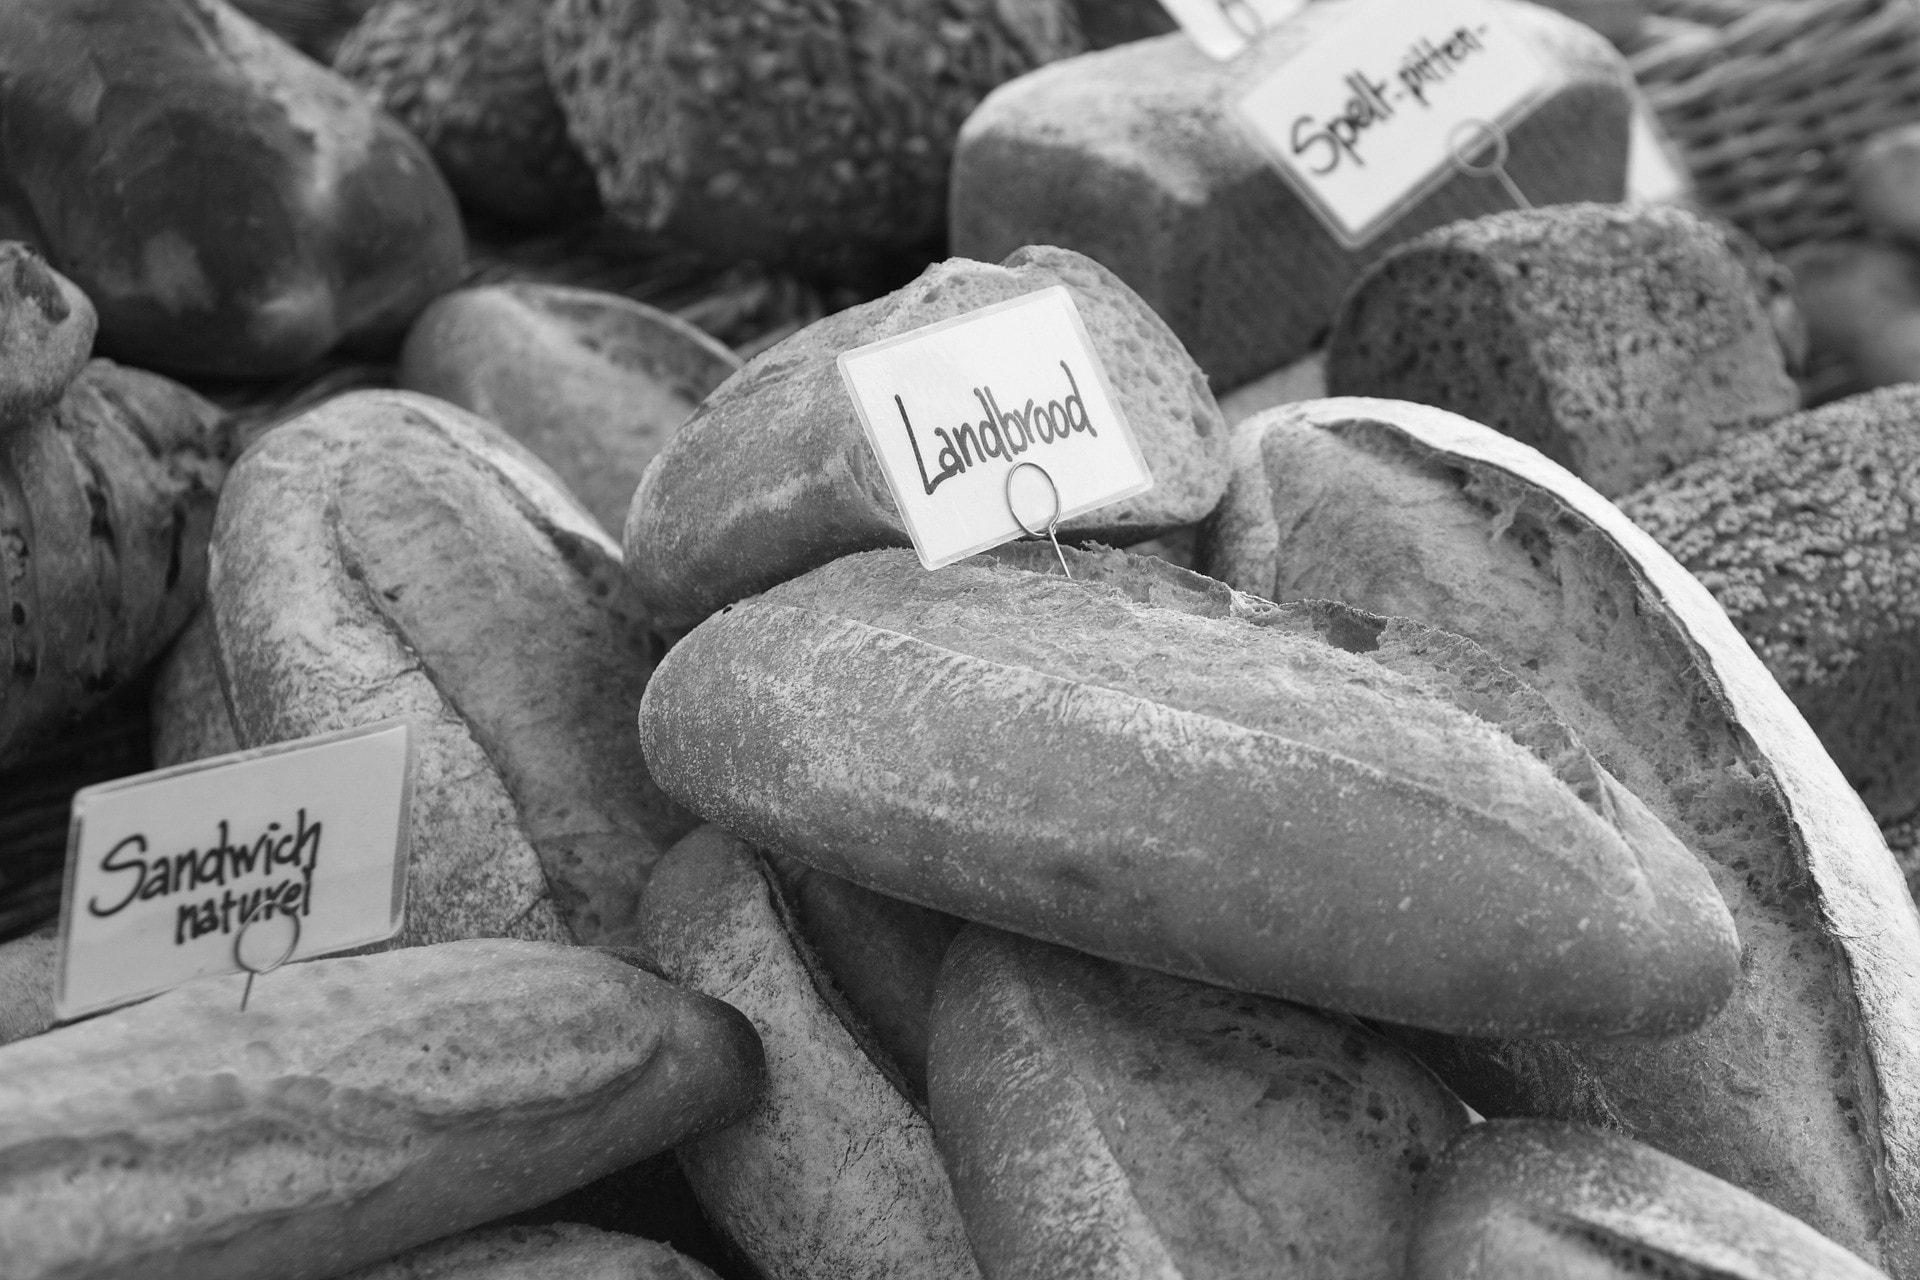 landbrood en andere soorten brood